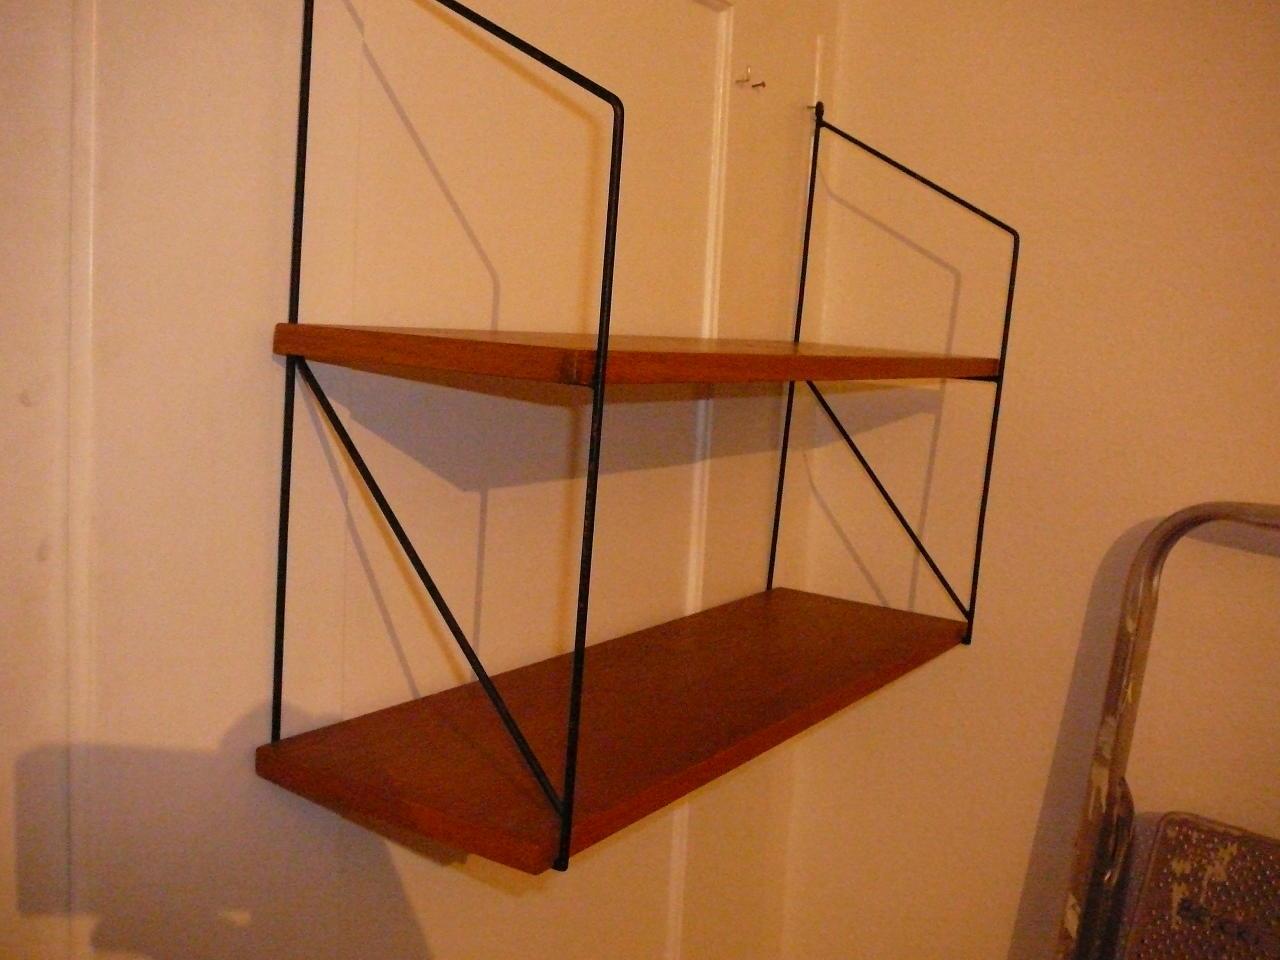 altes nissen string regal original teak in aarau kaufen bei. Black Bedroom Furniture Sets. Home Design Ideas